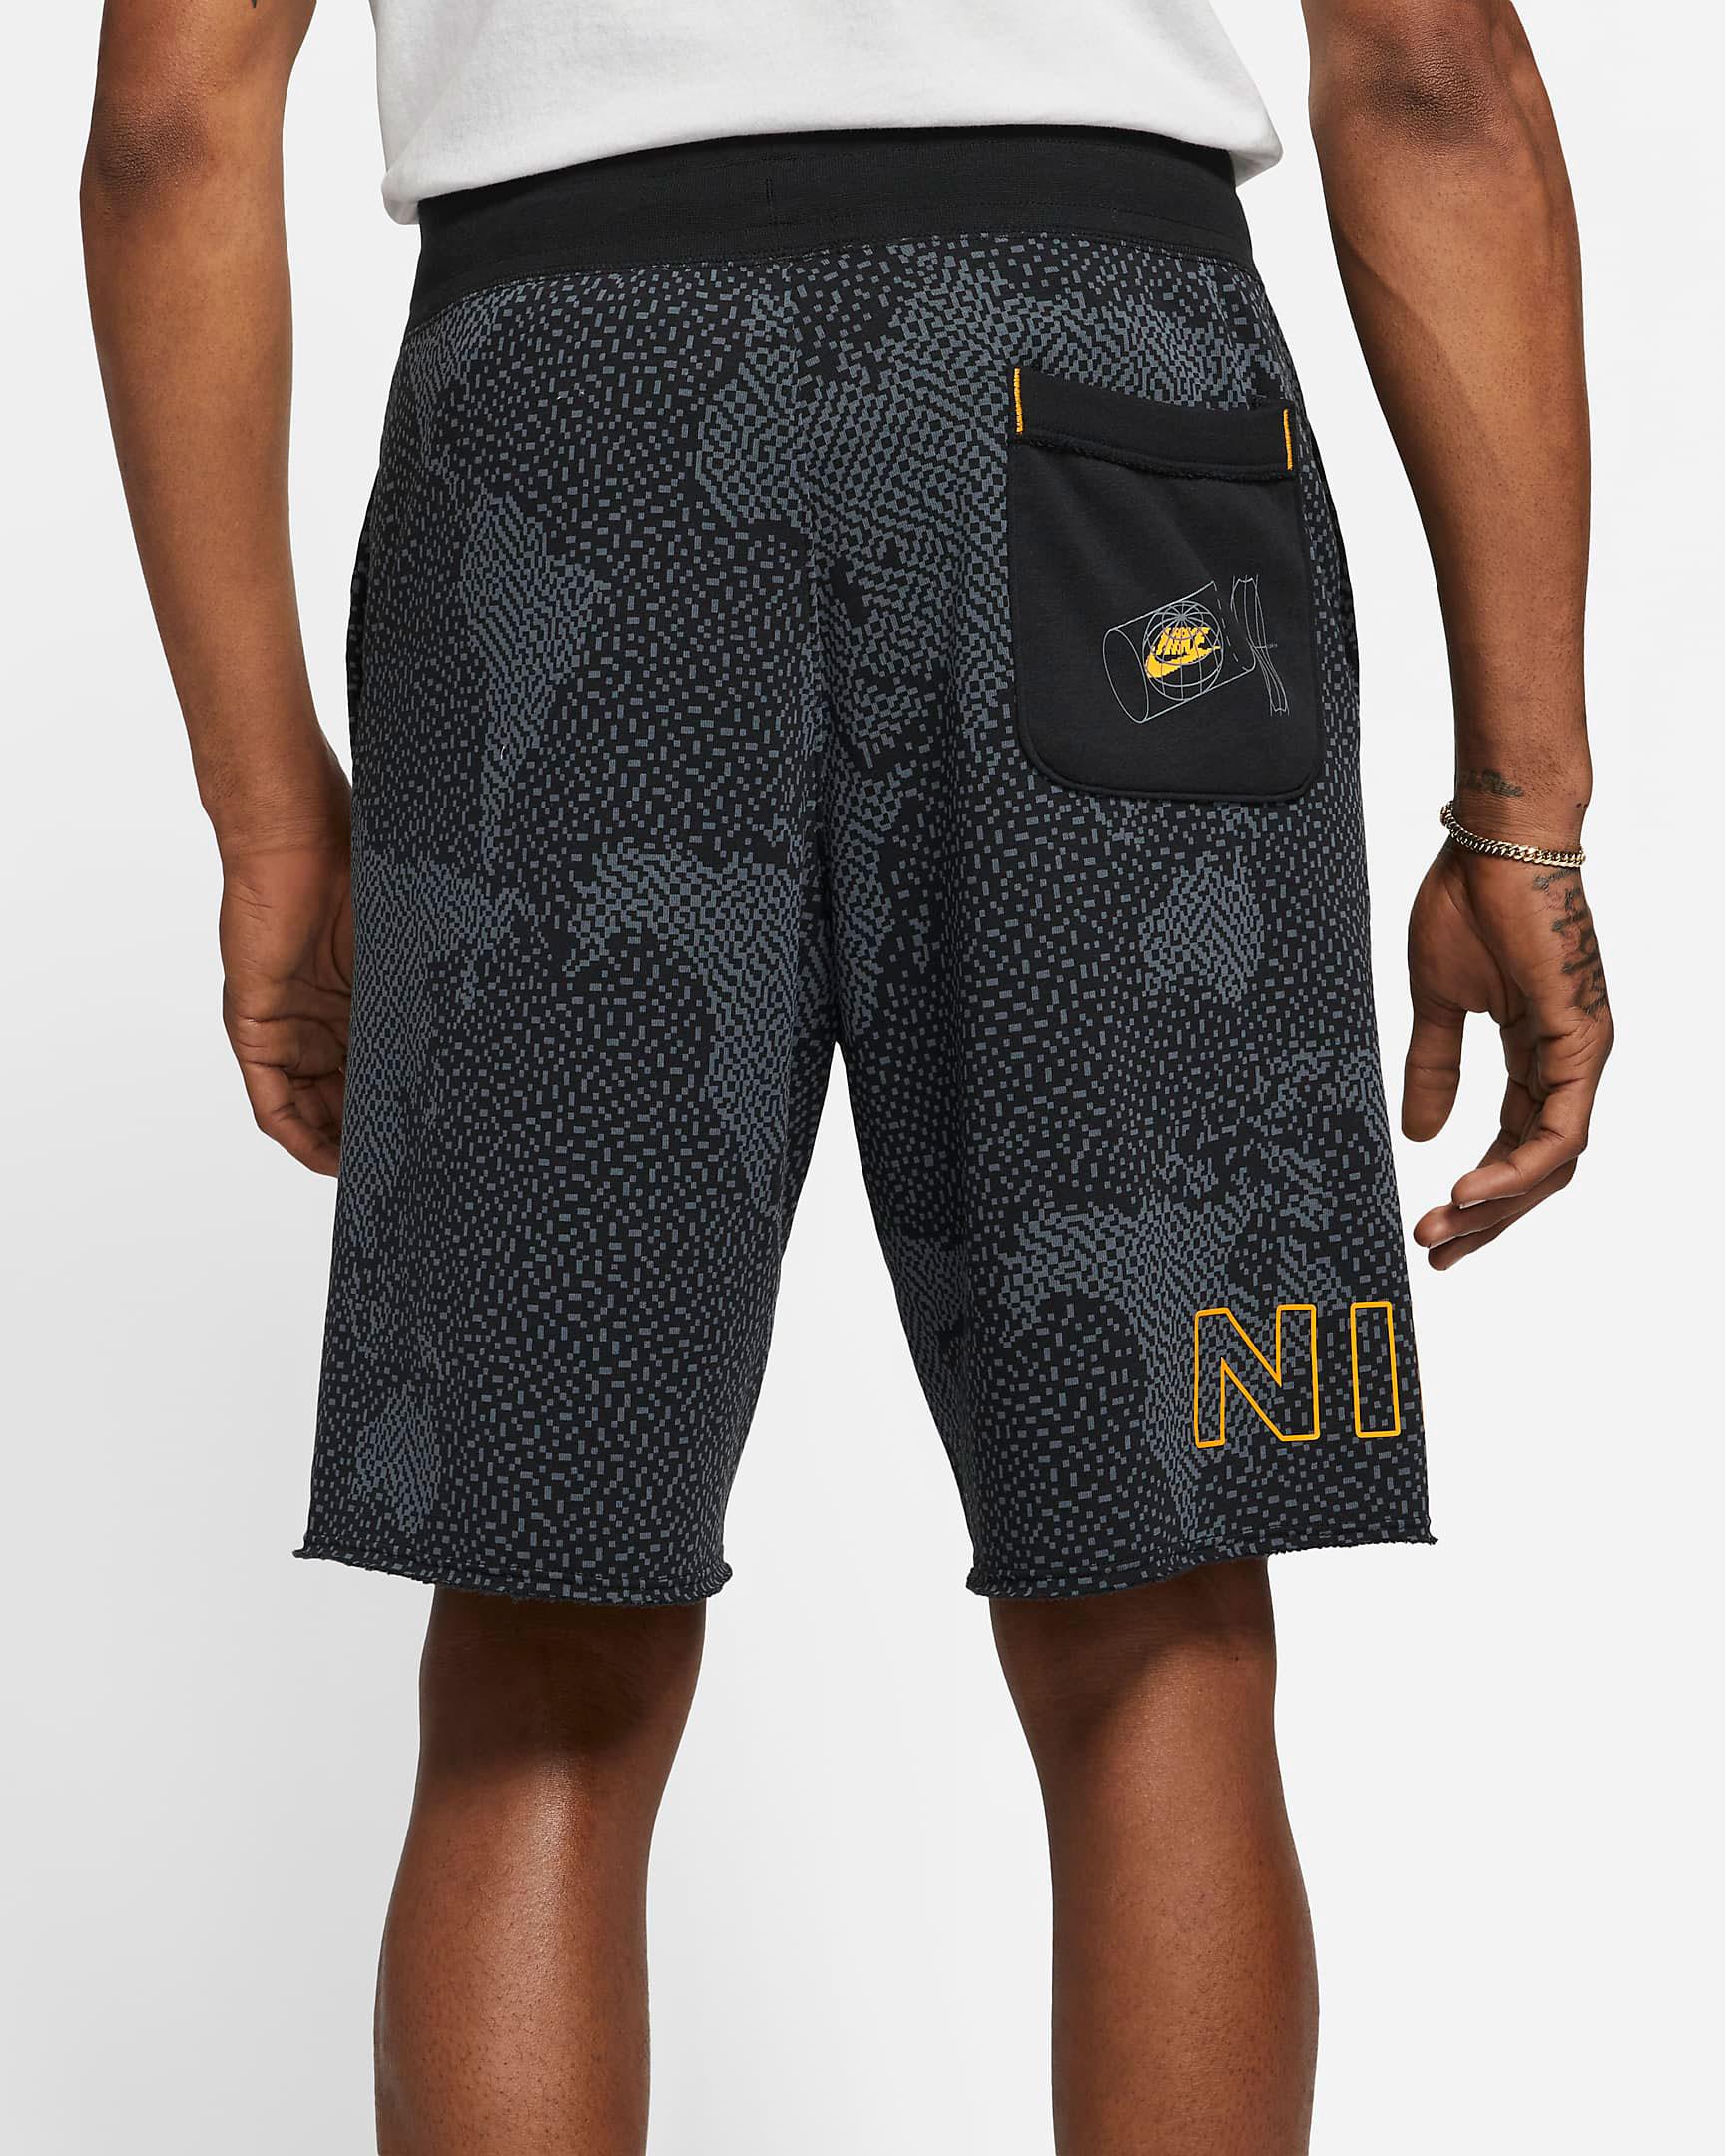 jordan-9-university-gold-nike-shorts-2